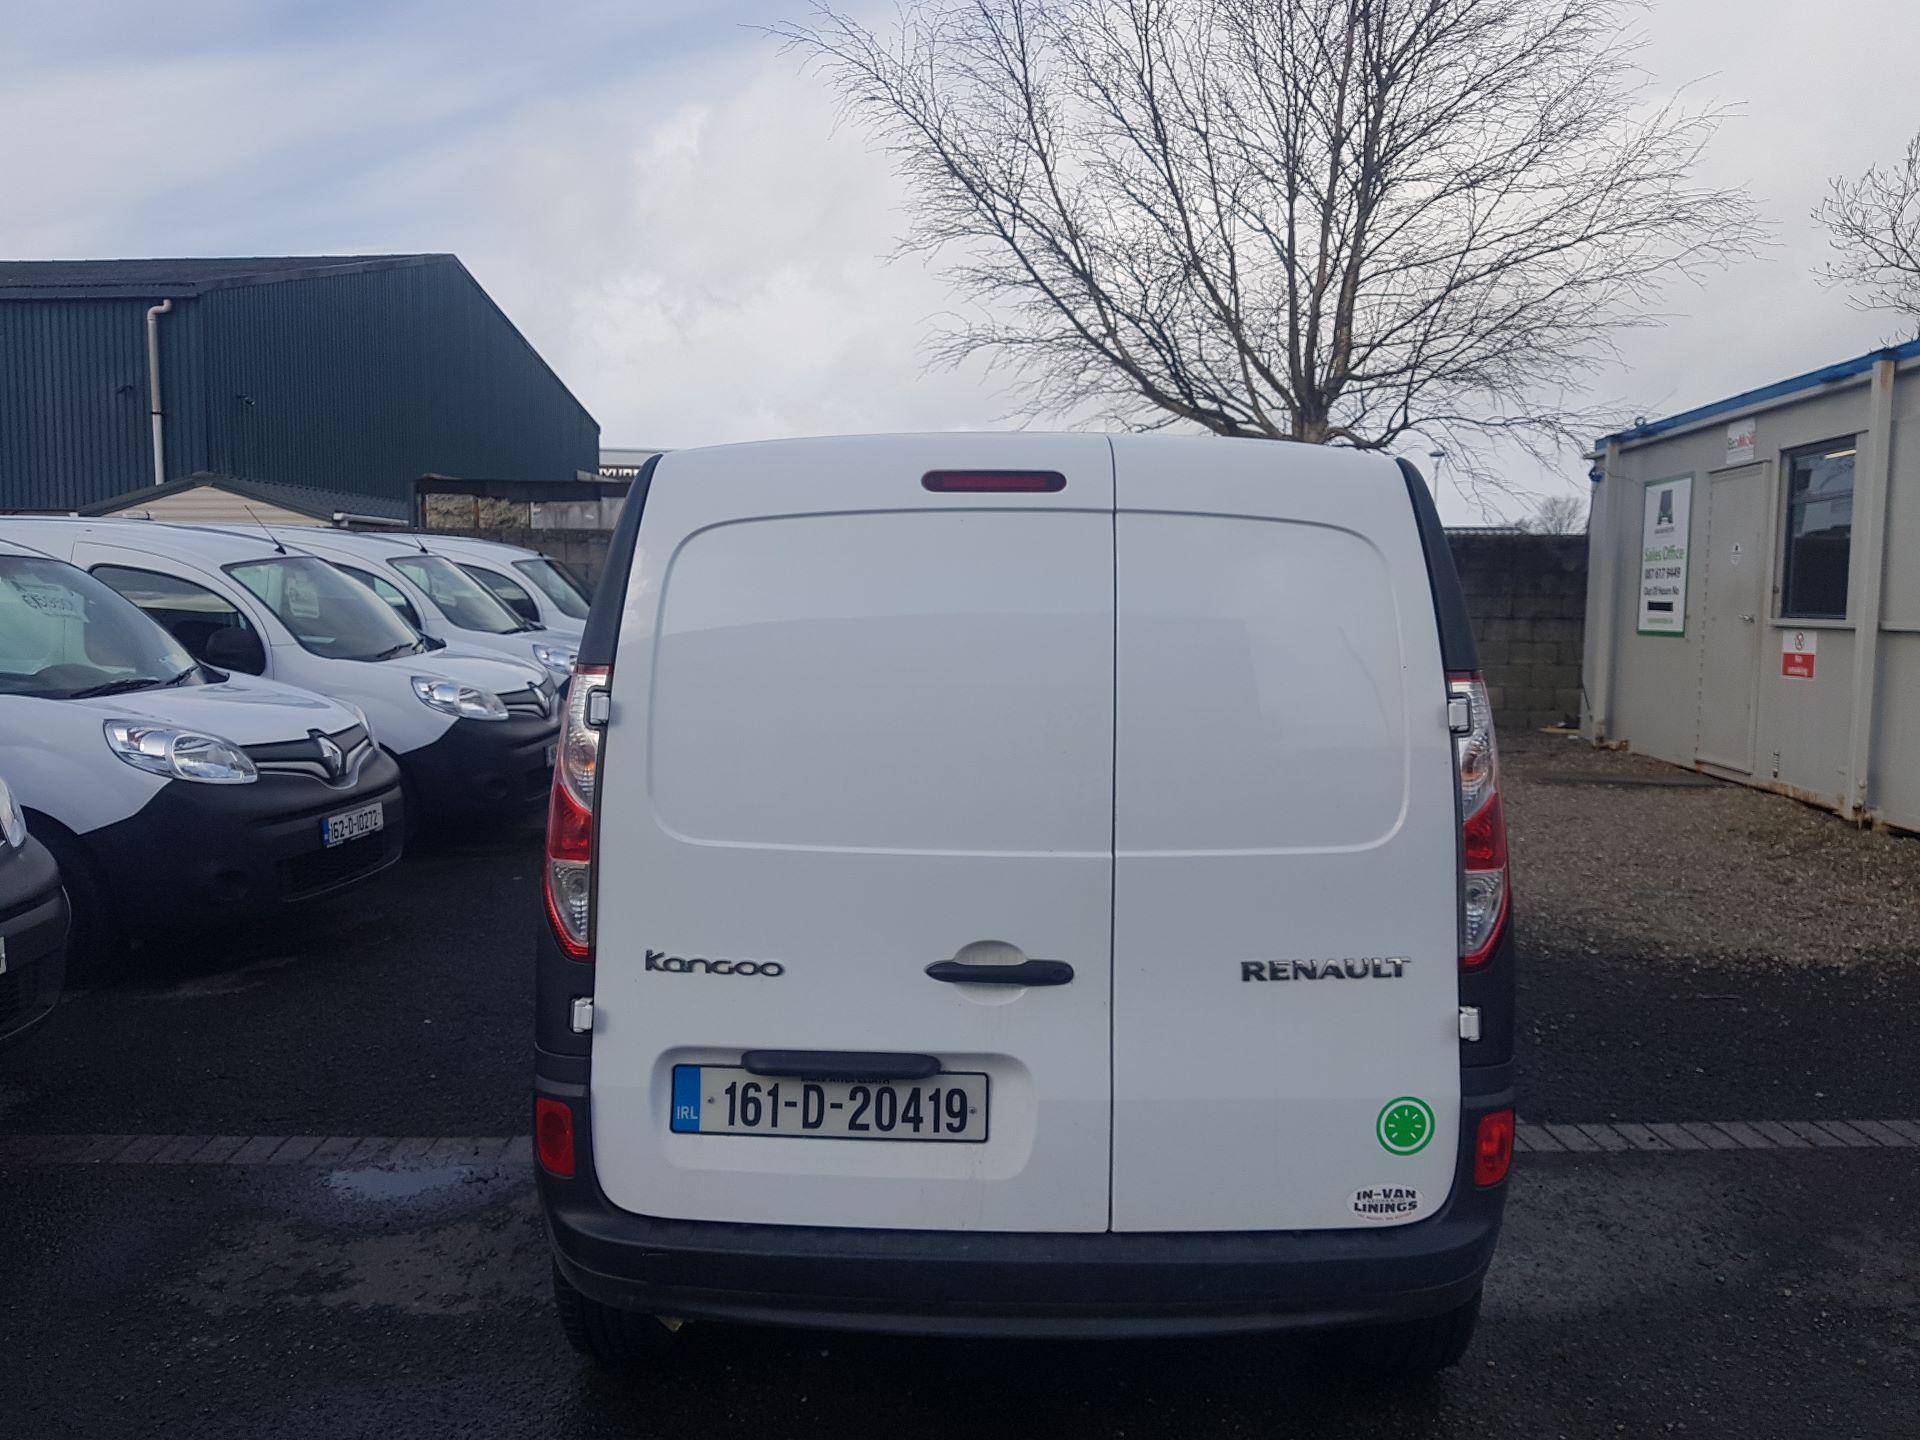 2016 Renault Kangoo 1.5 DCI 75 Business 2DR (161D20419) Image 4